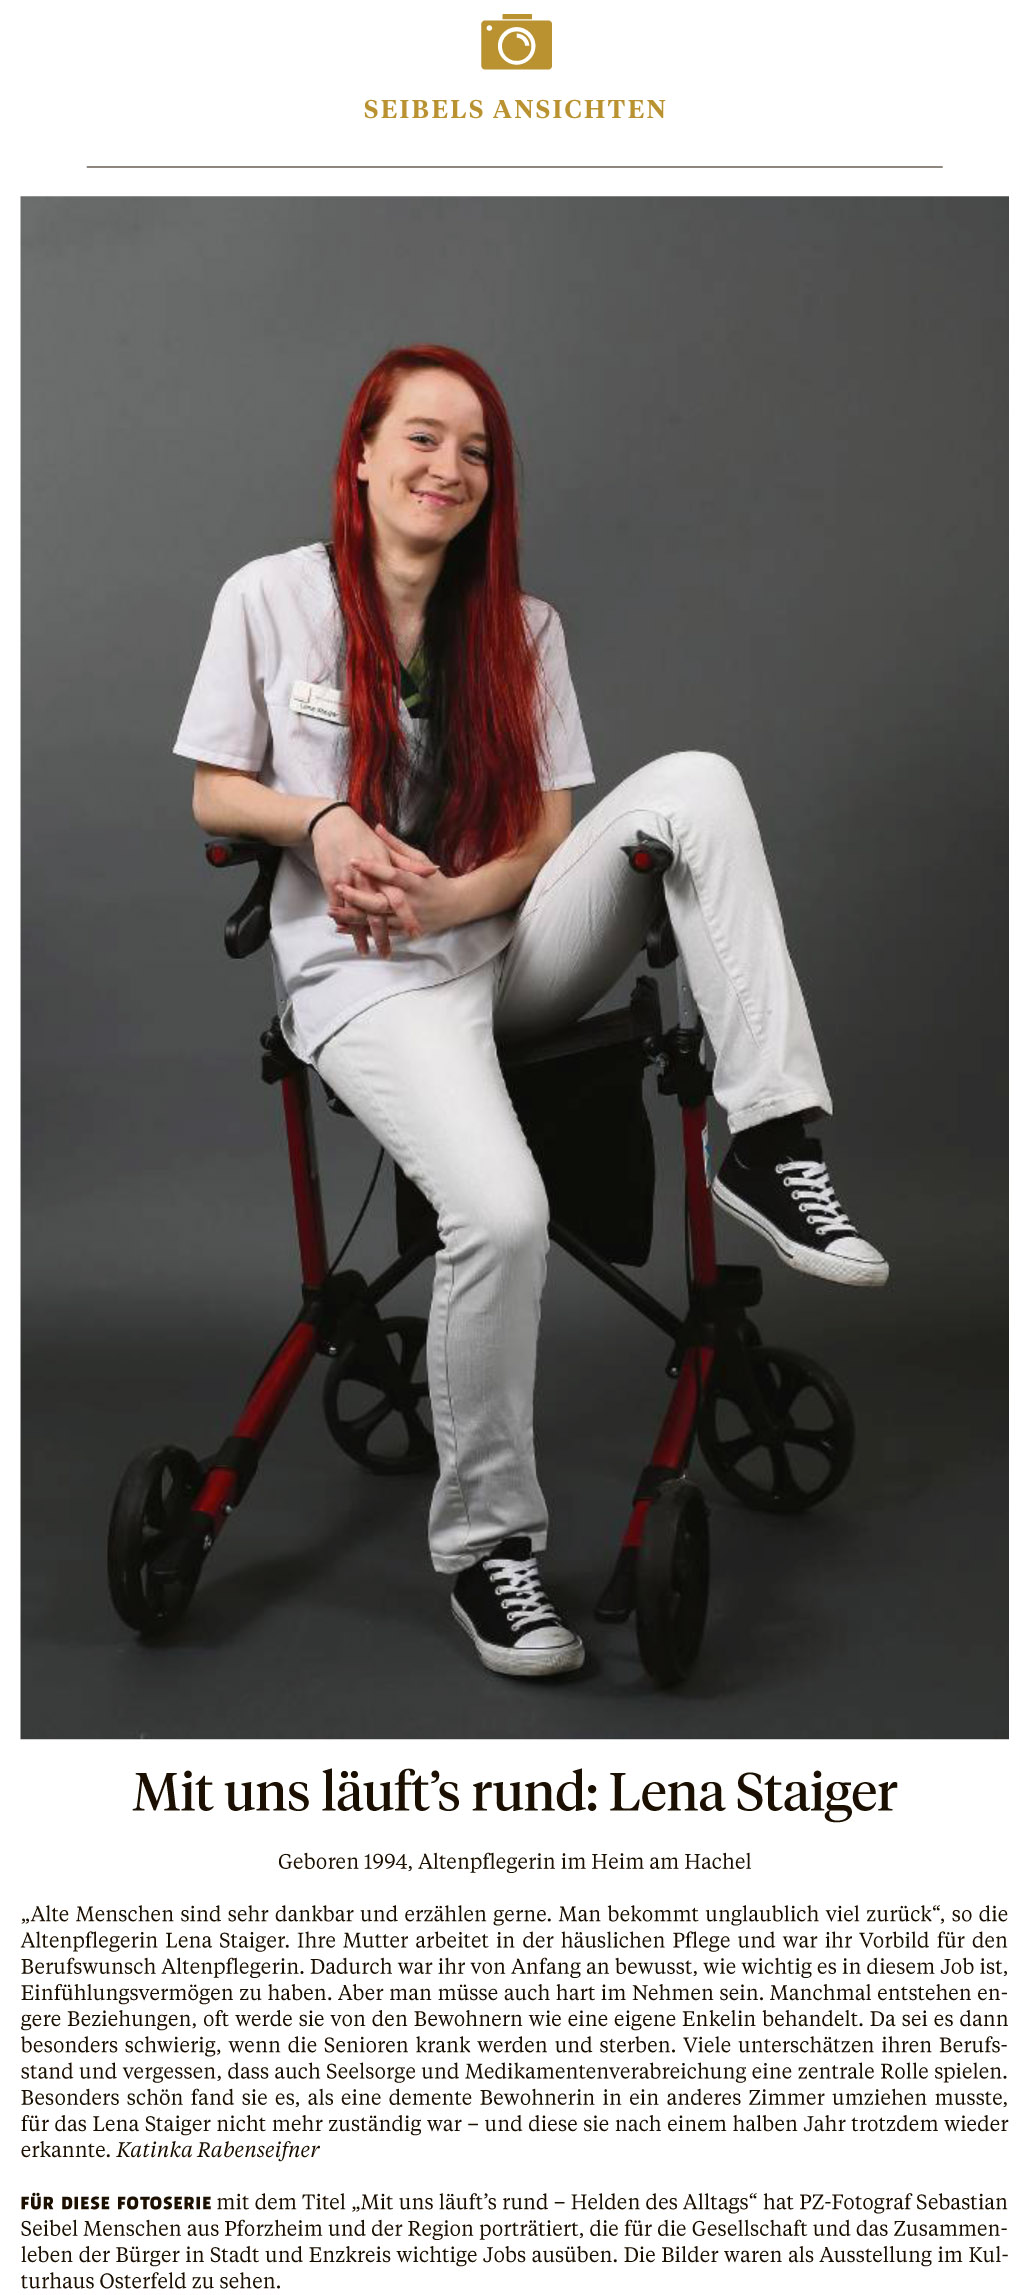 Lena Steiger, Altenpflegerin